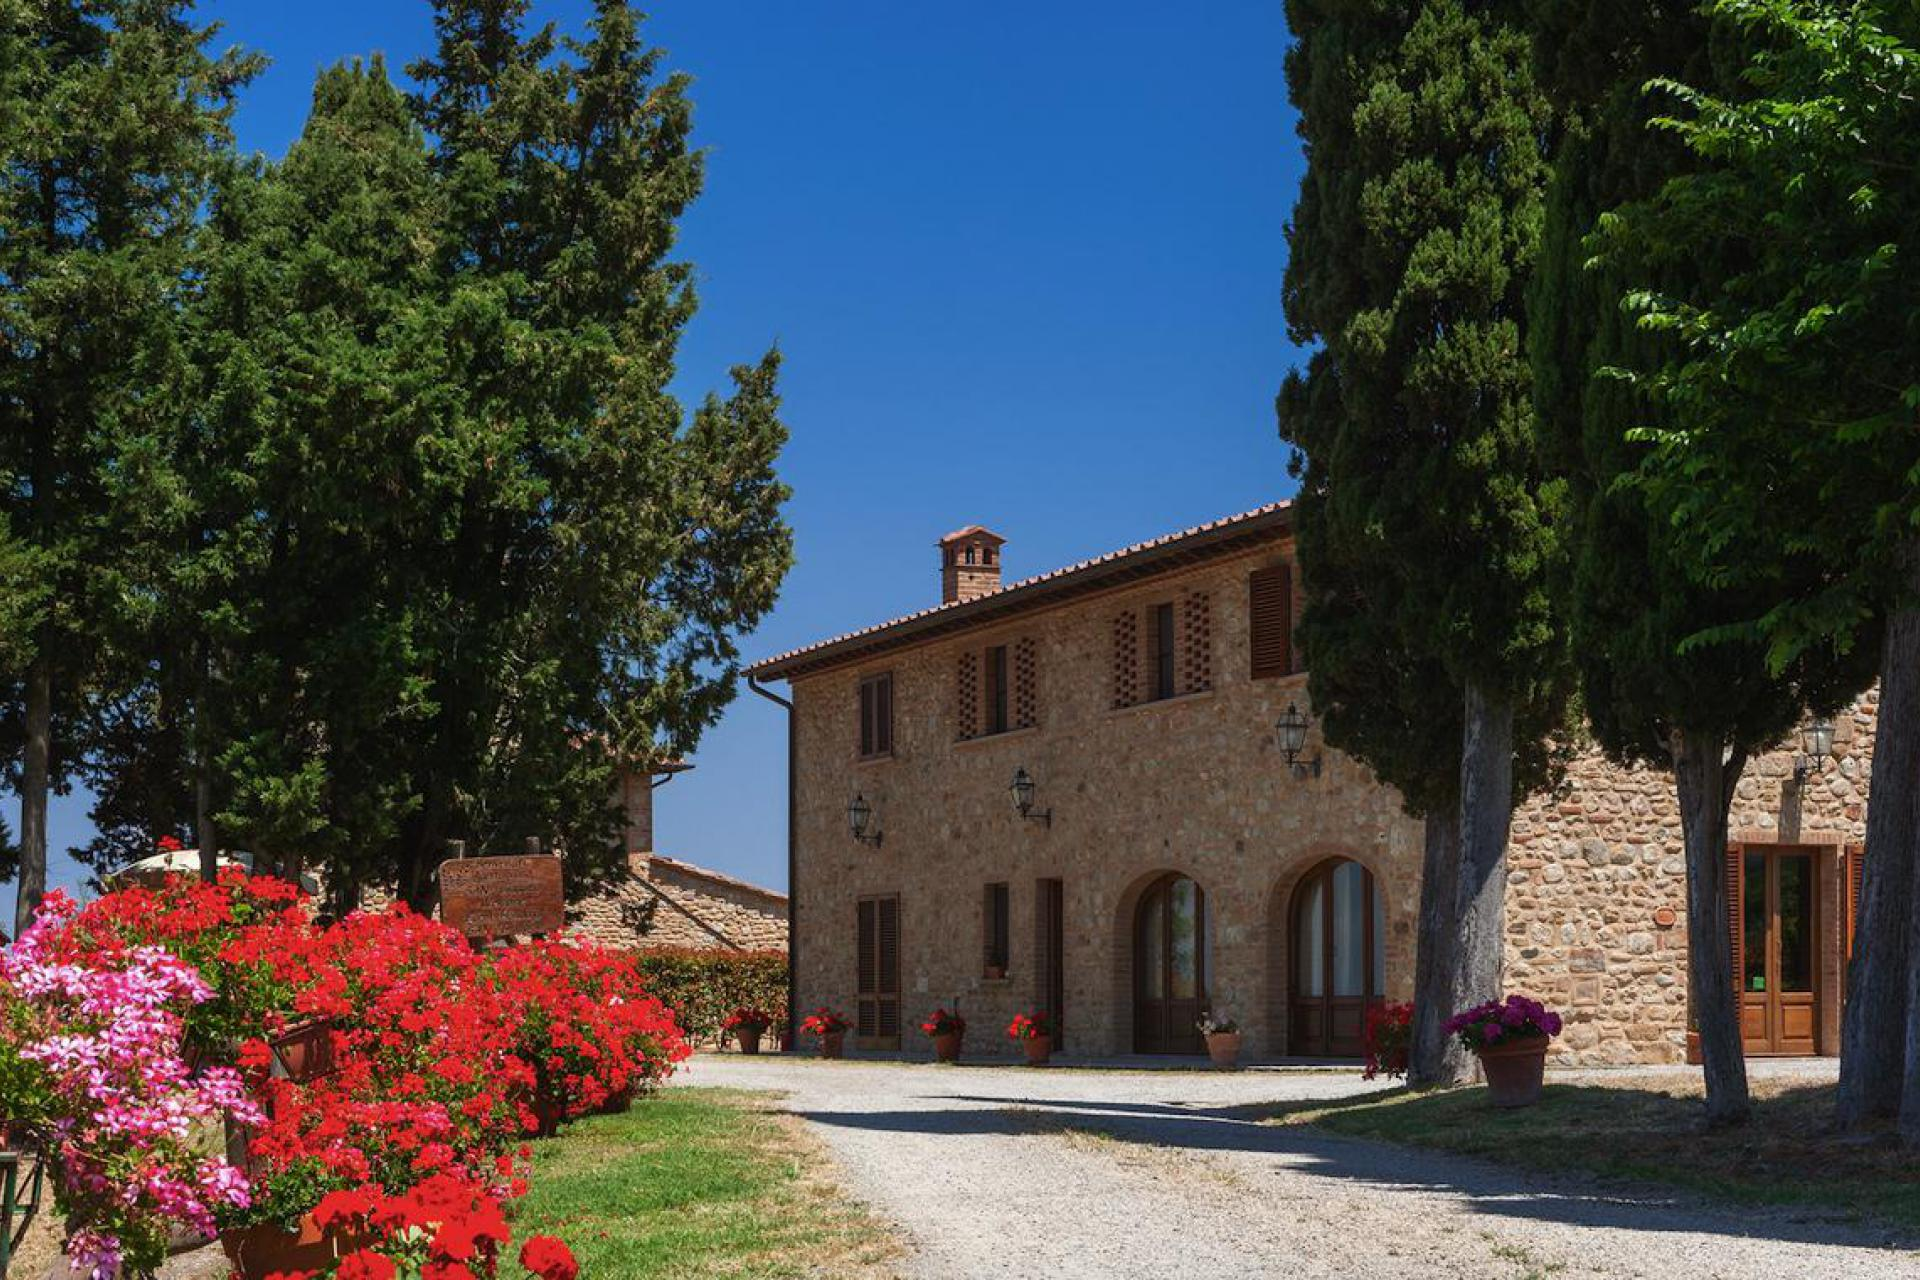 Agriturismo Toskana Agriturismo Toskana, hier kocht die Mama